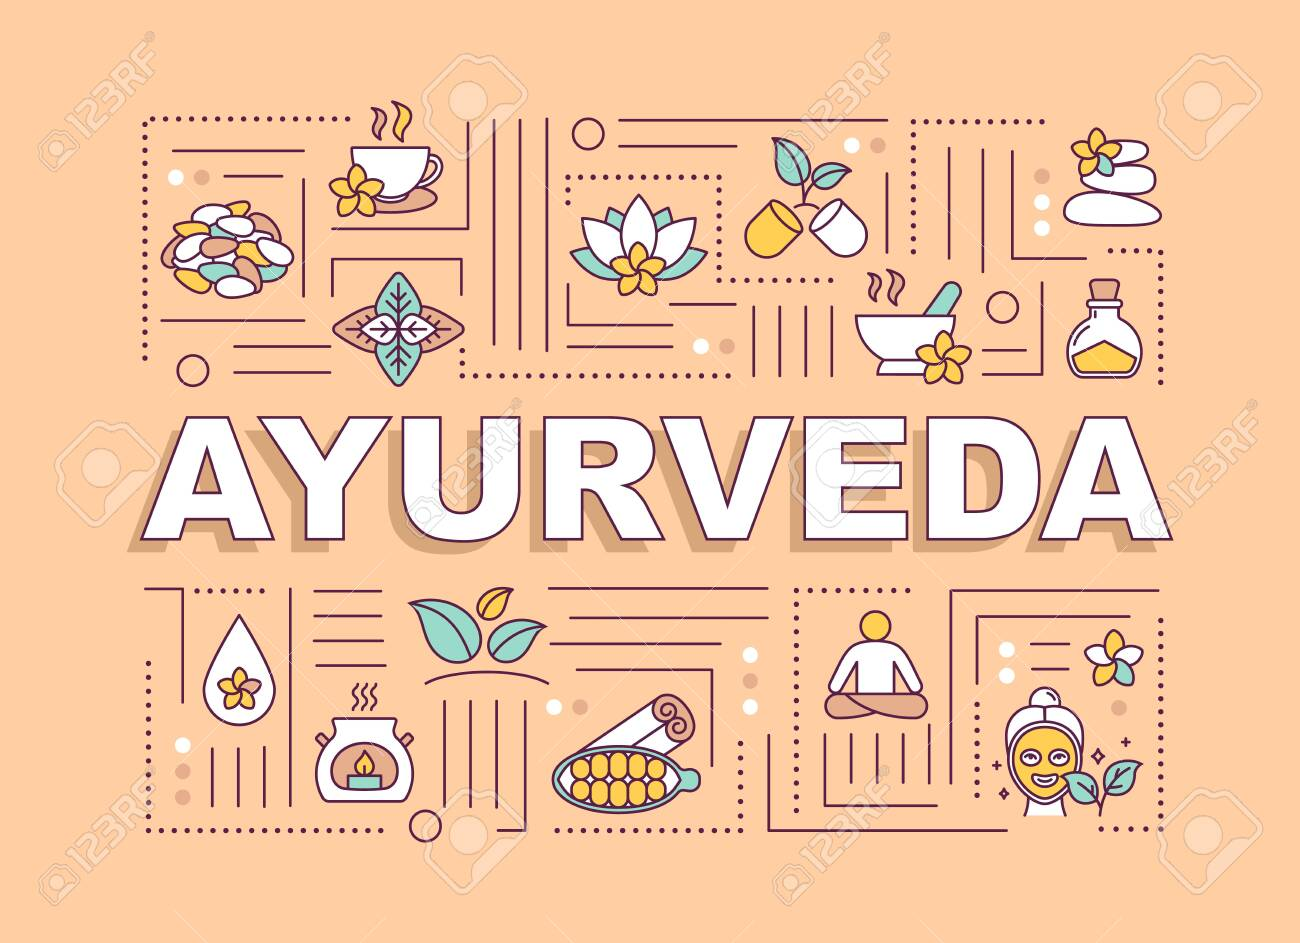 Ayurveda Word Concepts Banner Ayurvedic Medicine Holistic Healing Royalty Free Cliparts Vectors And Stock Illustration Image 140755014